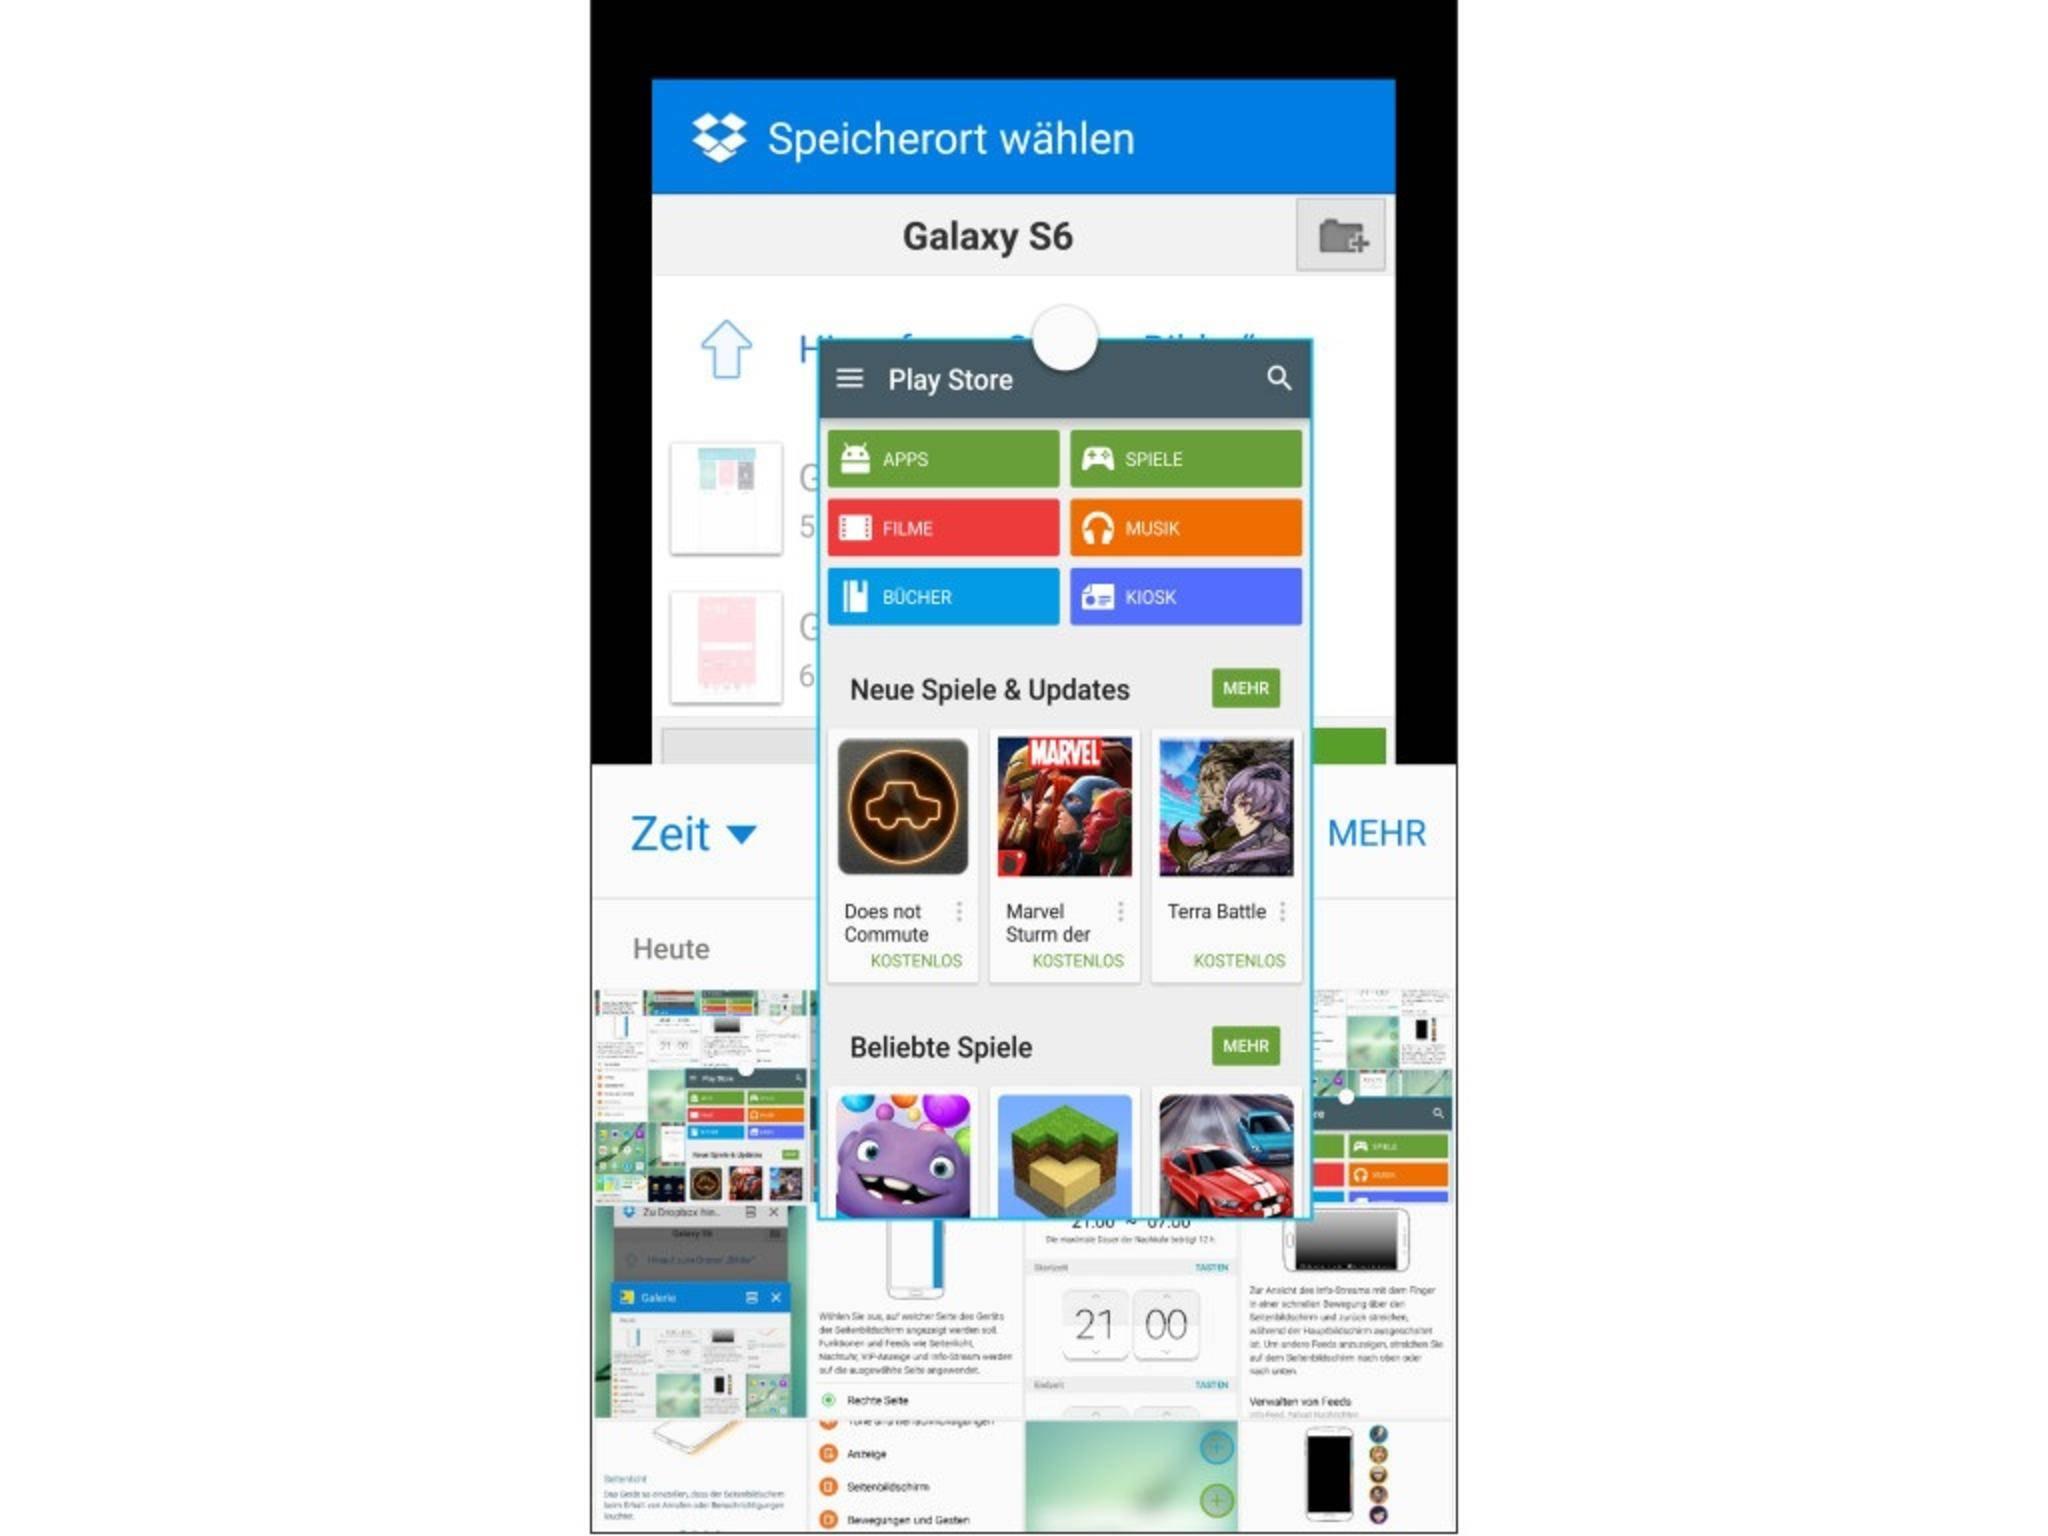 Galaxy S6 Screenshot 24